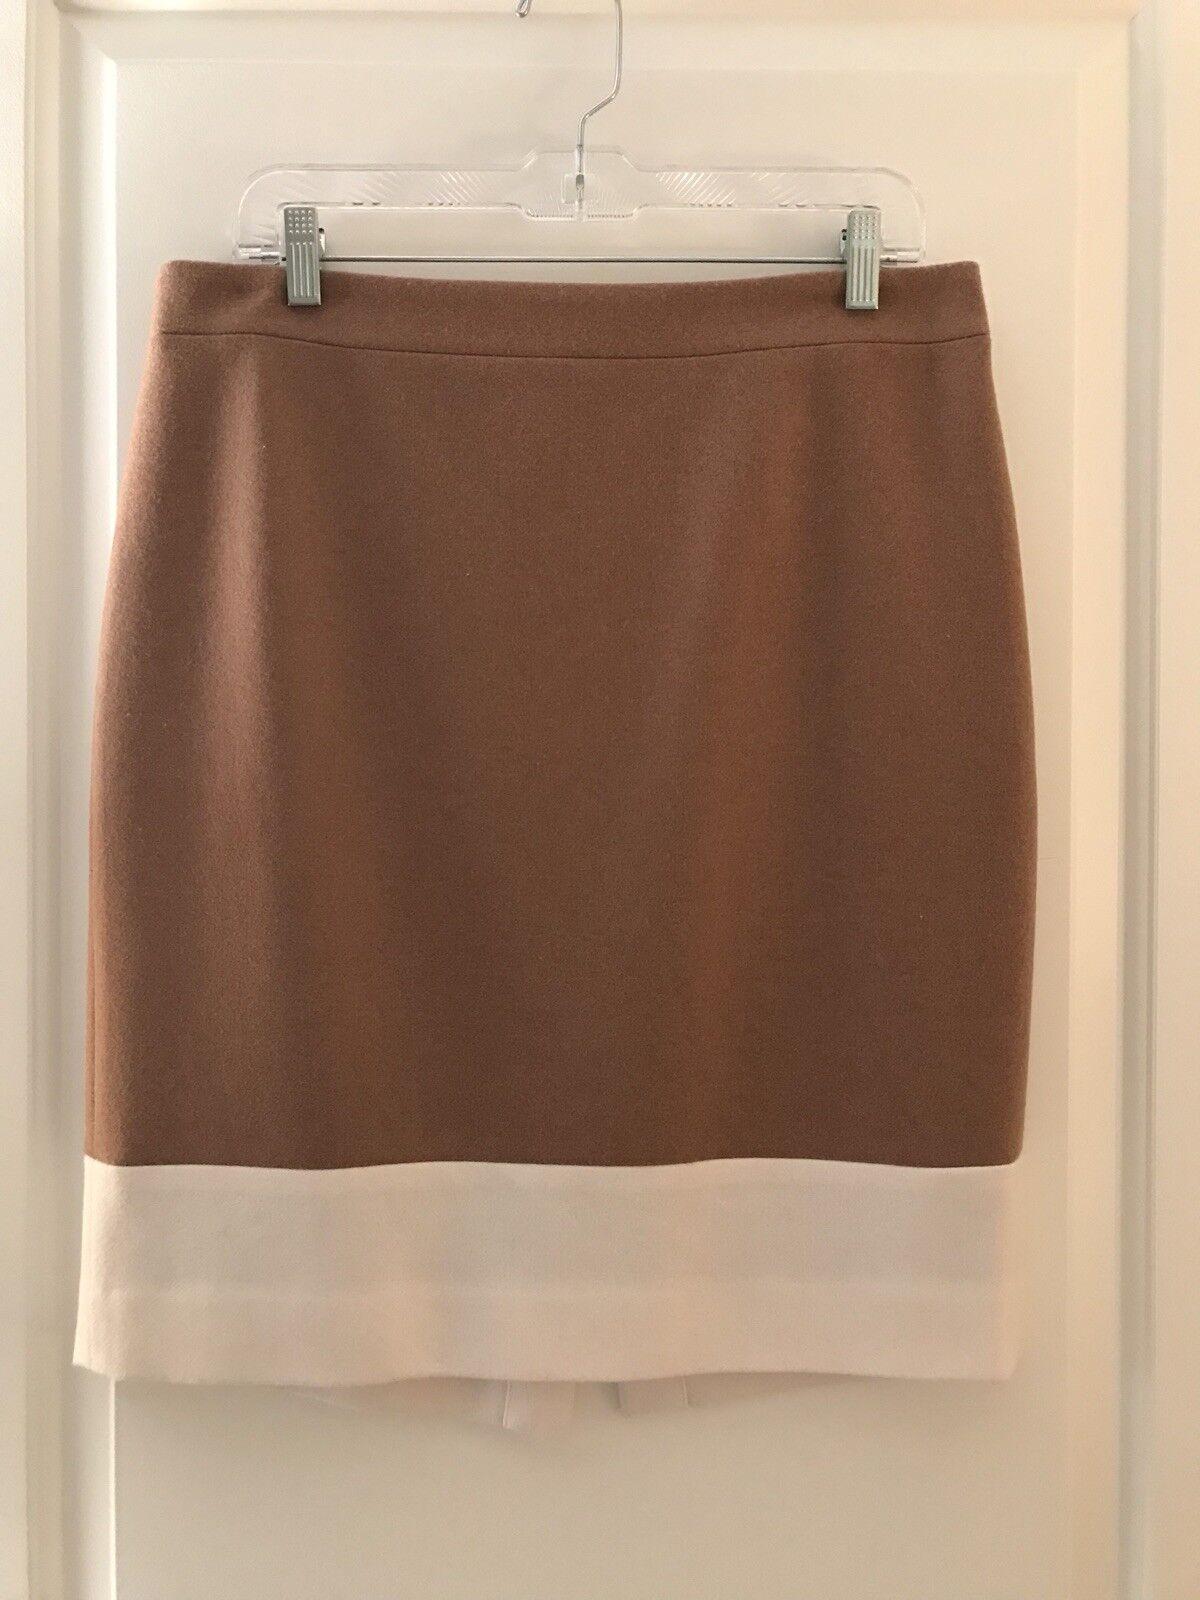 J.Crew Factory Pencil Skirt Sz 12 in Tan Cream Double-Serge Wool - EUC